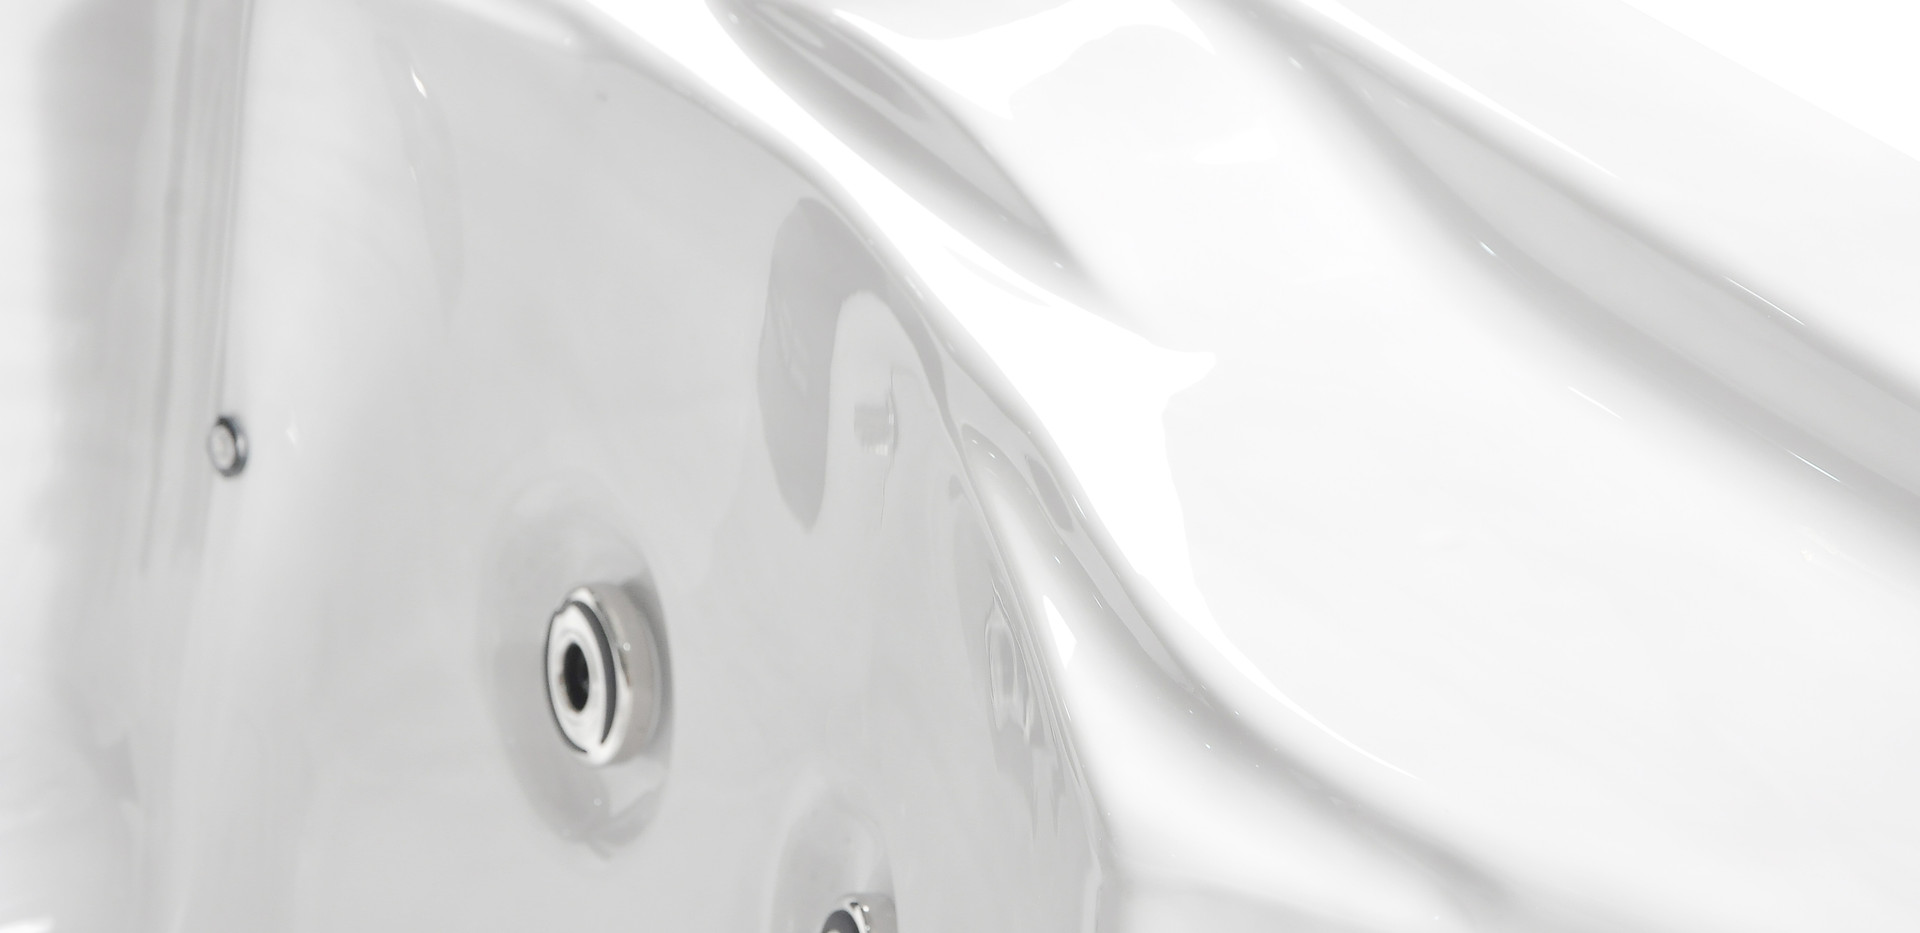 Venezia sterling silver close up 8.jpg